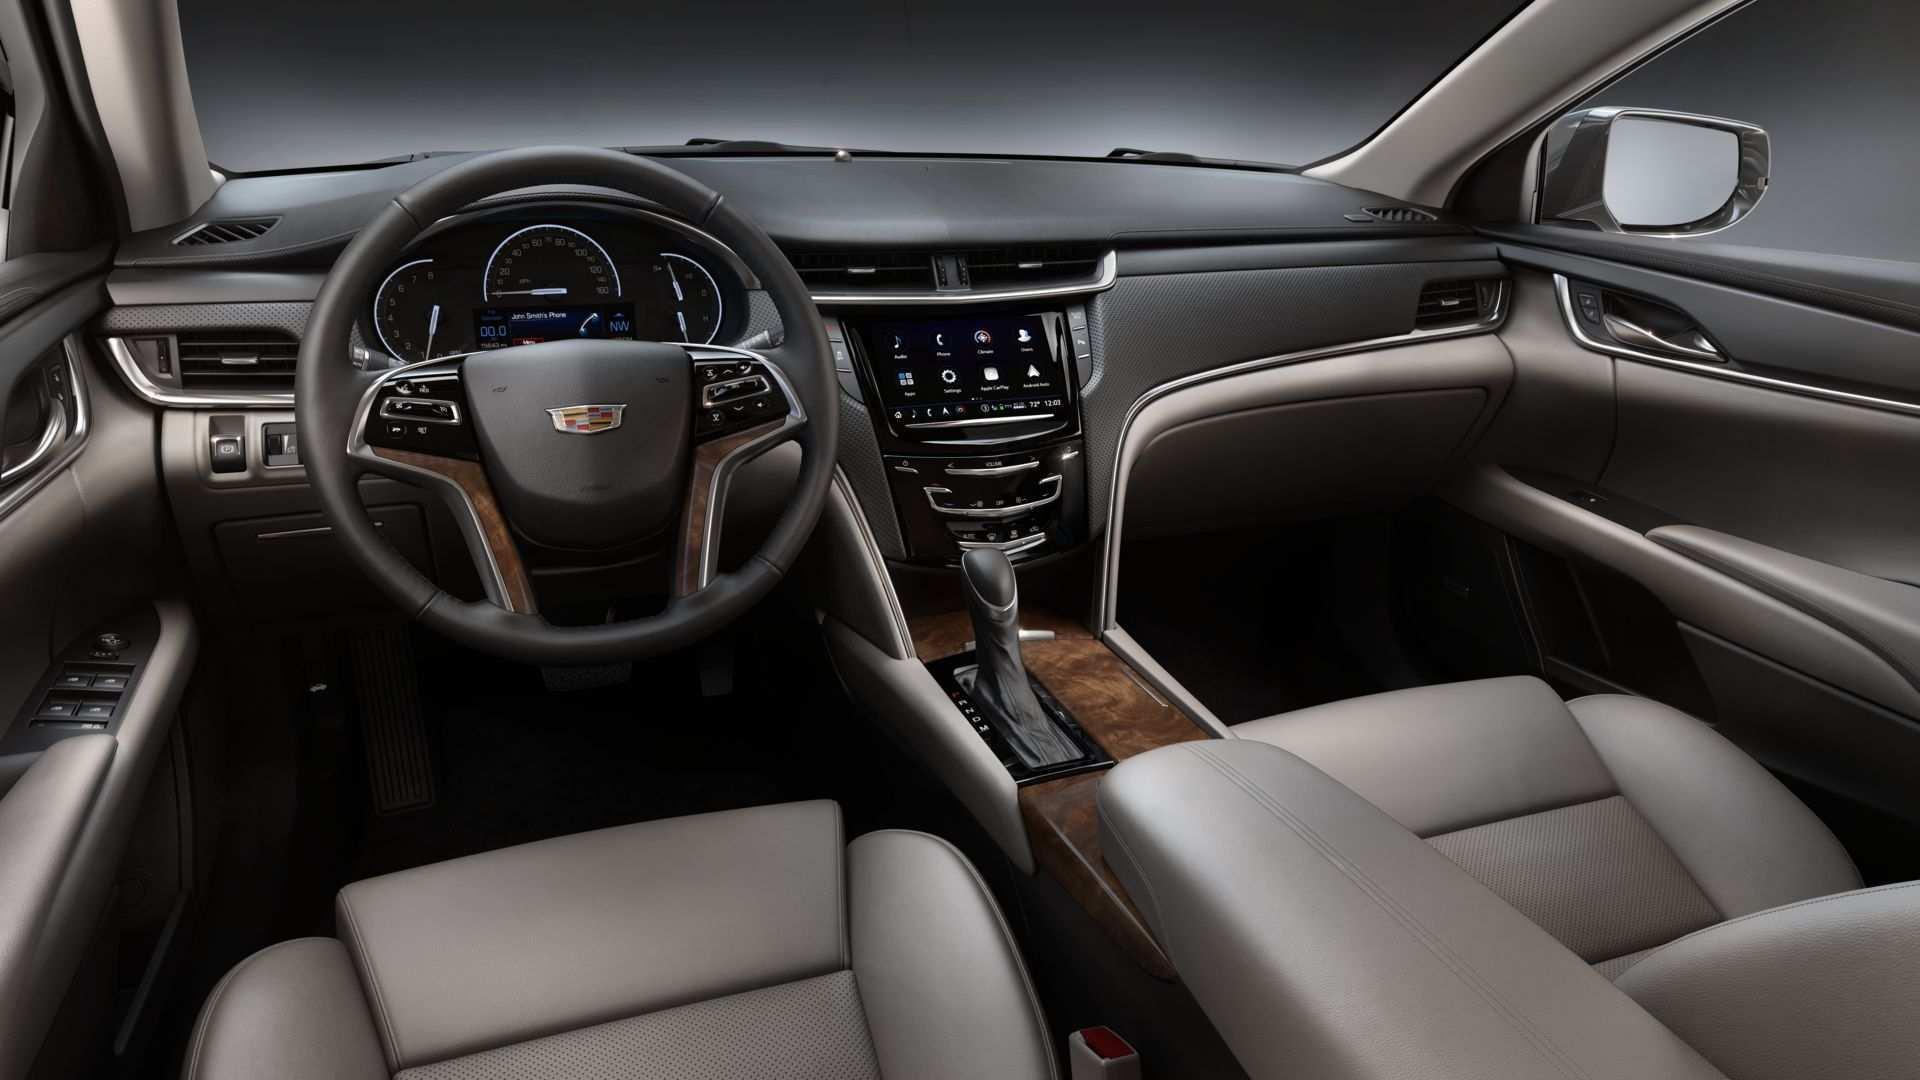 44 New 2019 Cadillac Interior Images with 2019 Cadillac Interior